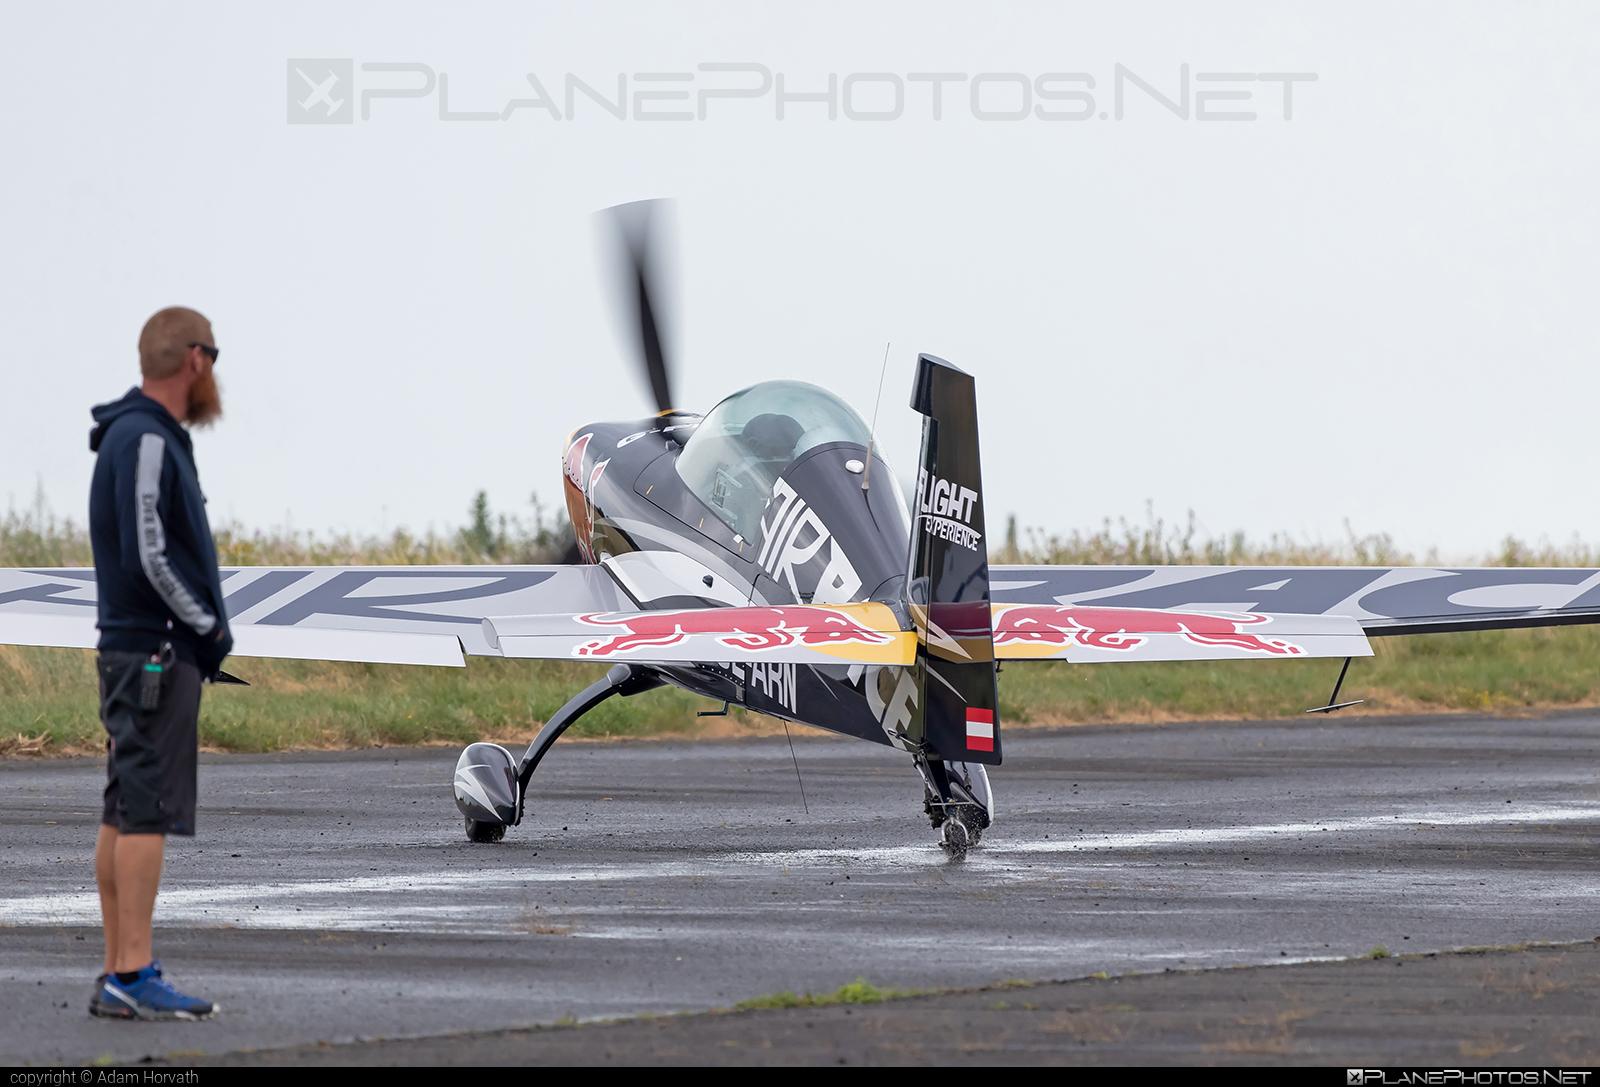 Extra EA-300LC - OE-ARN operated by Private operator #extra300 #extra300lc #extraea300 #extraea300lc #redbullairrace #redbullairracebalaton